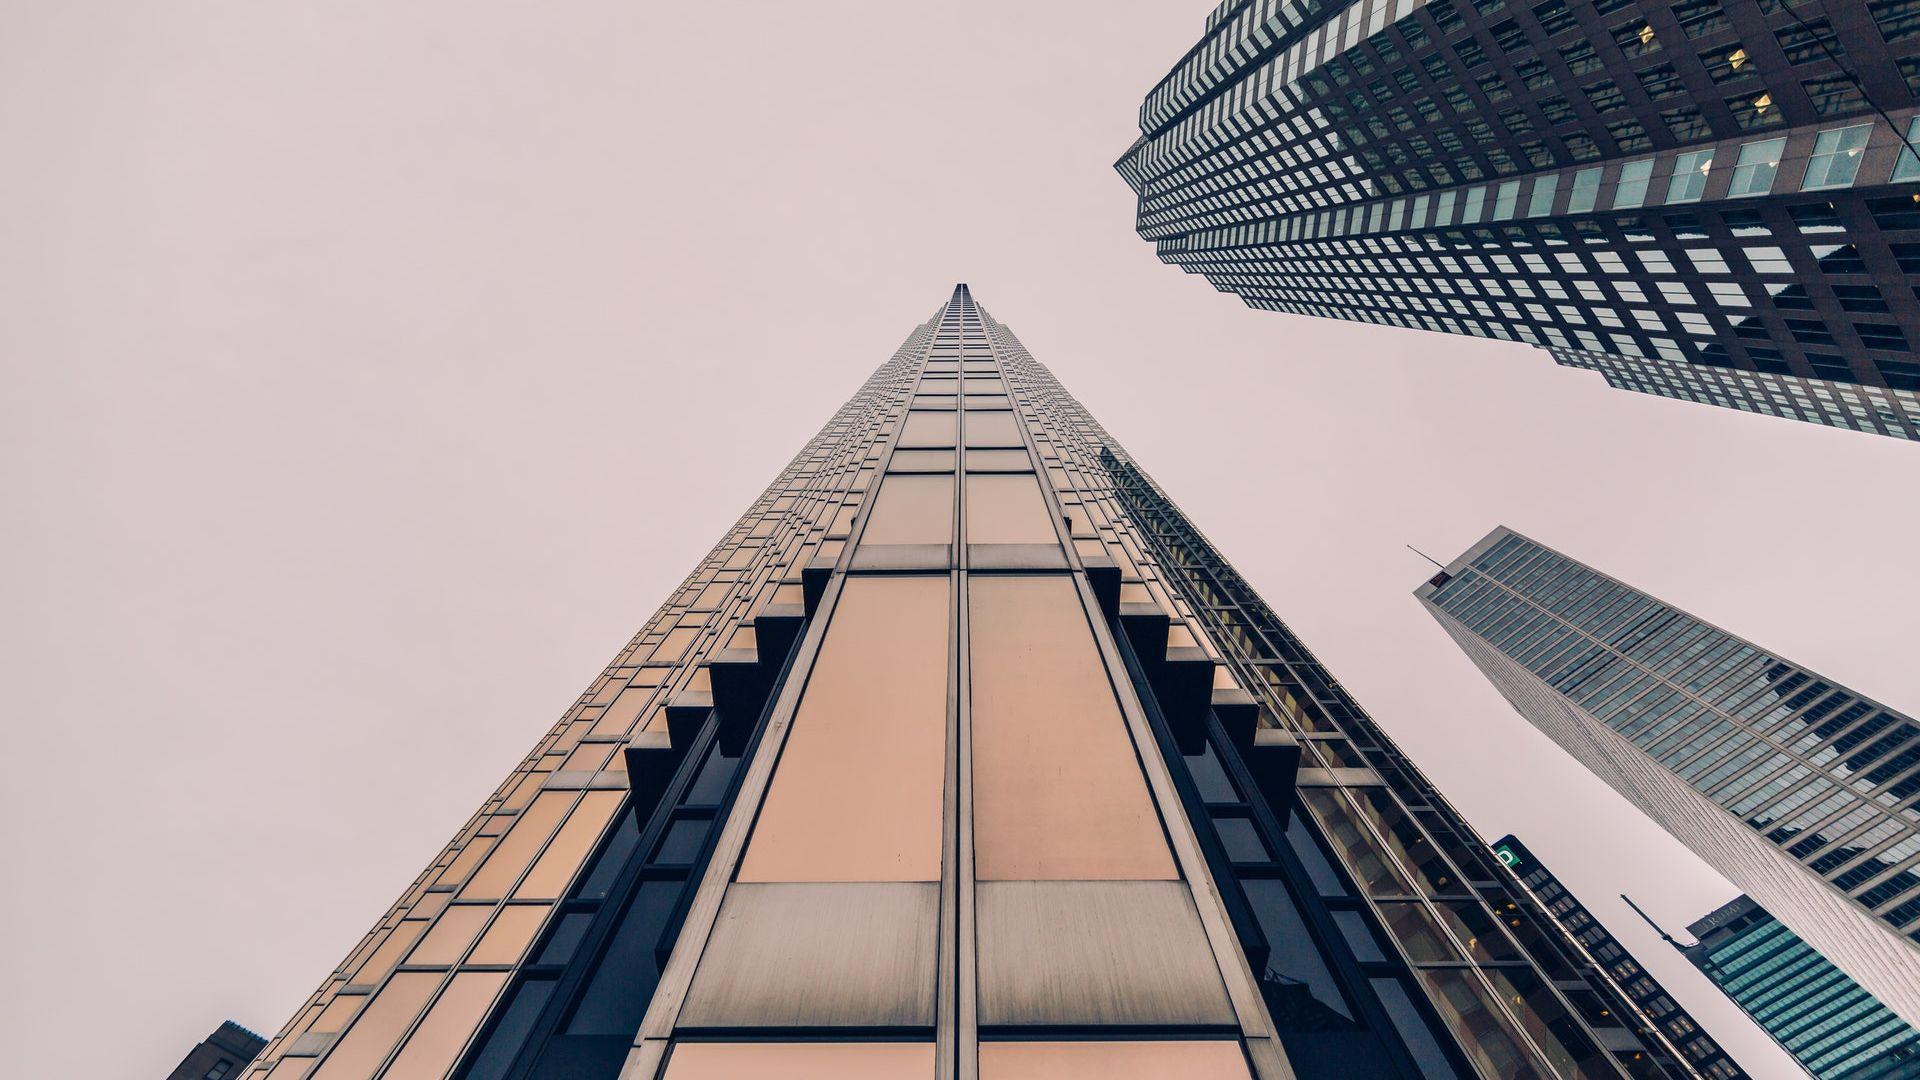 Sky High Buildings Wallpaper   Wallpaper Stream 1920x1080